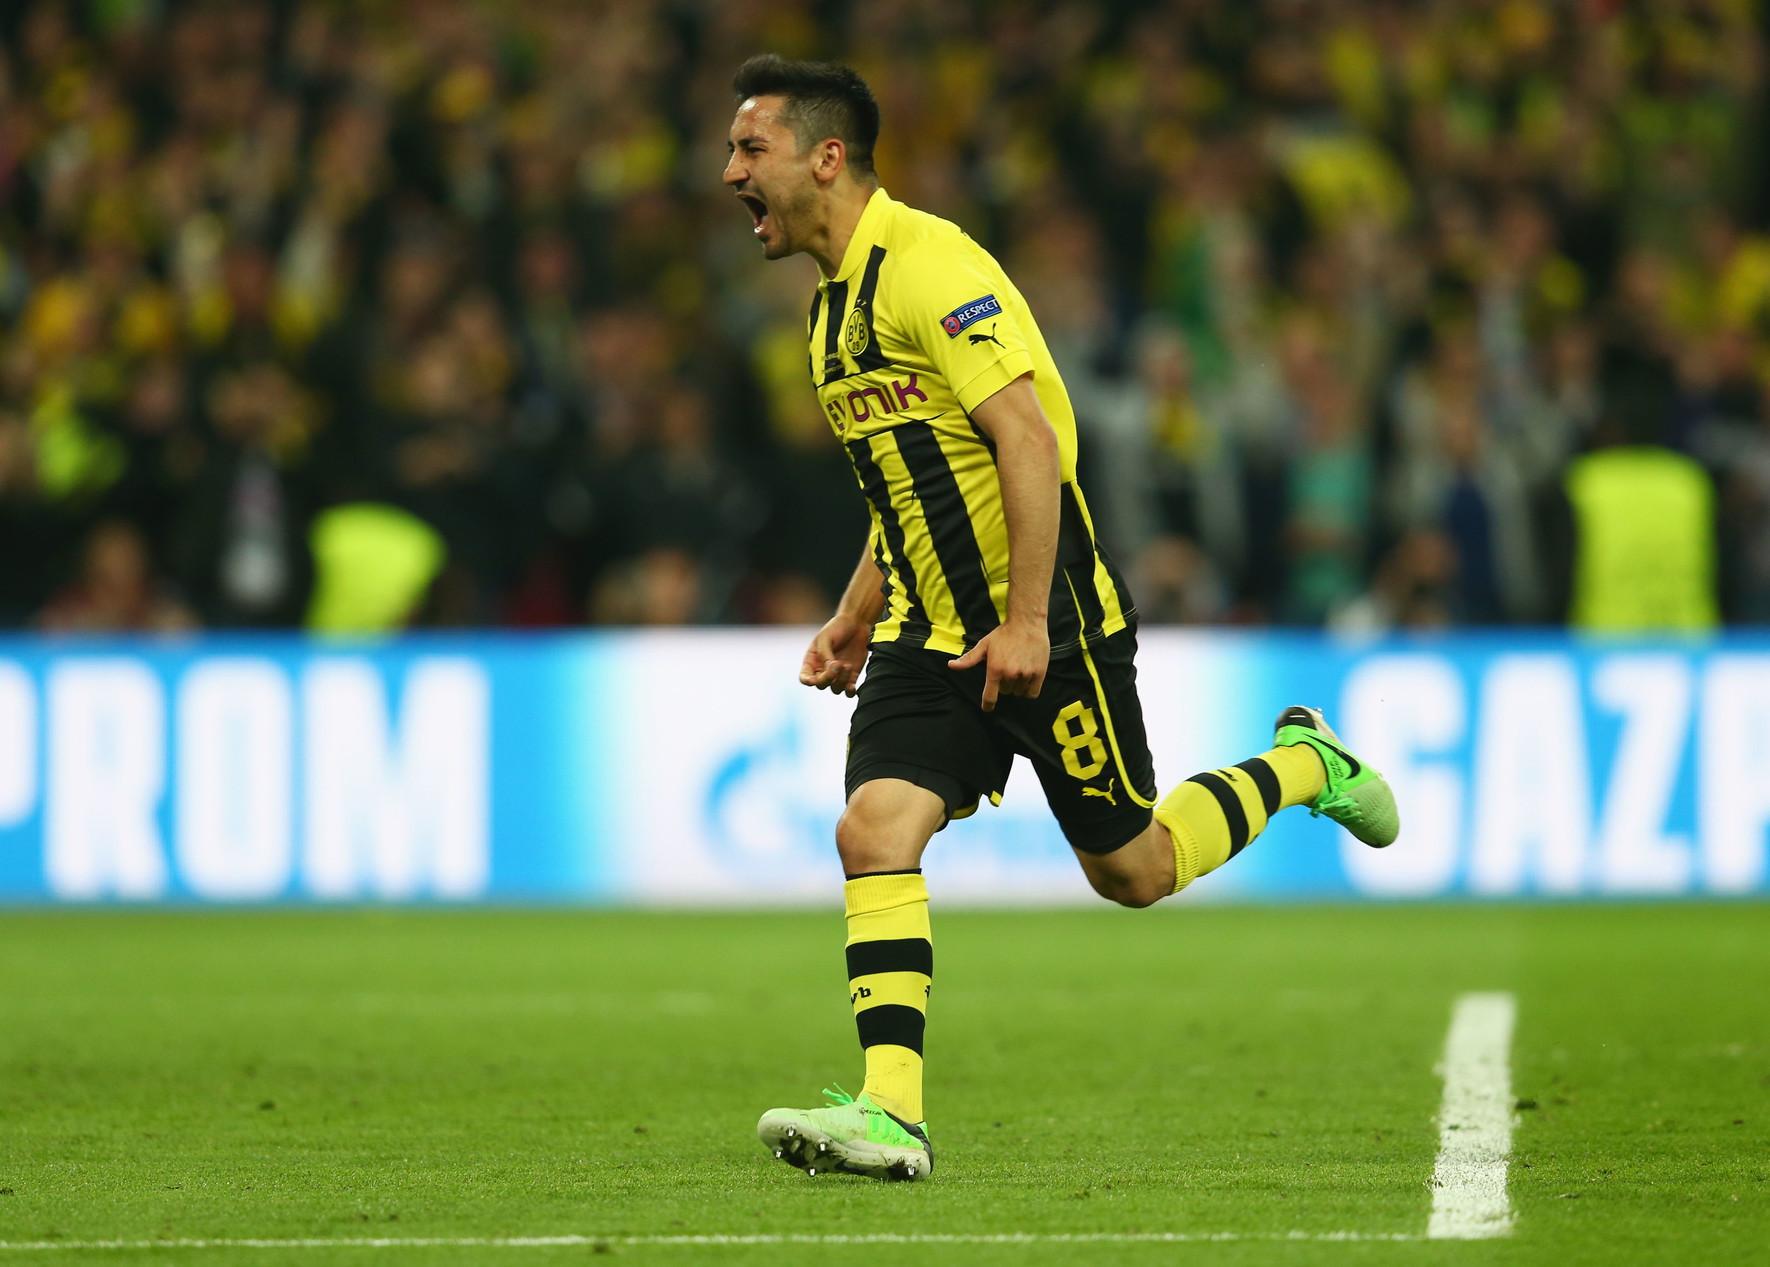 2016, Ilkay Gundogan: acquistato a 5,5 milioni dal Norimberga, venduto a 27 milioni al Manchester City